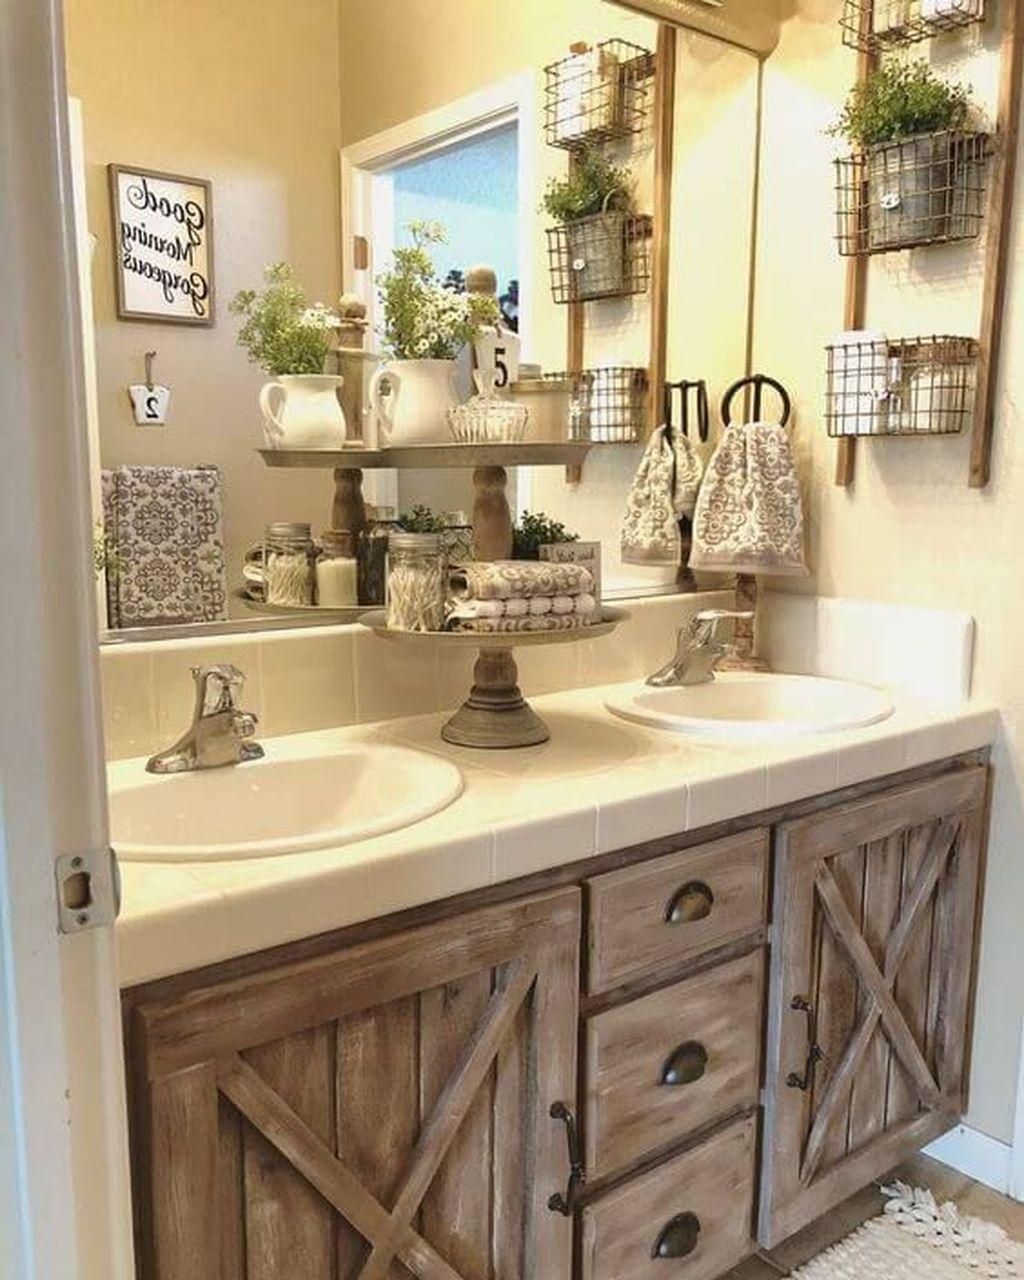 Fascinating Rustic Bathroom Decor Ideas You Must Copy 09